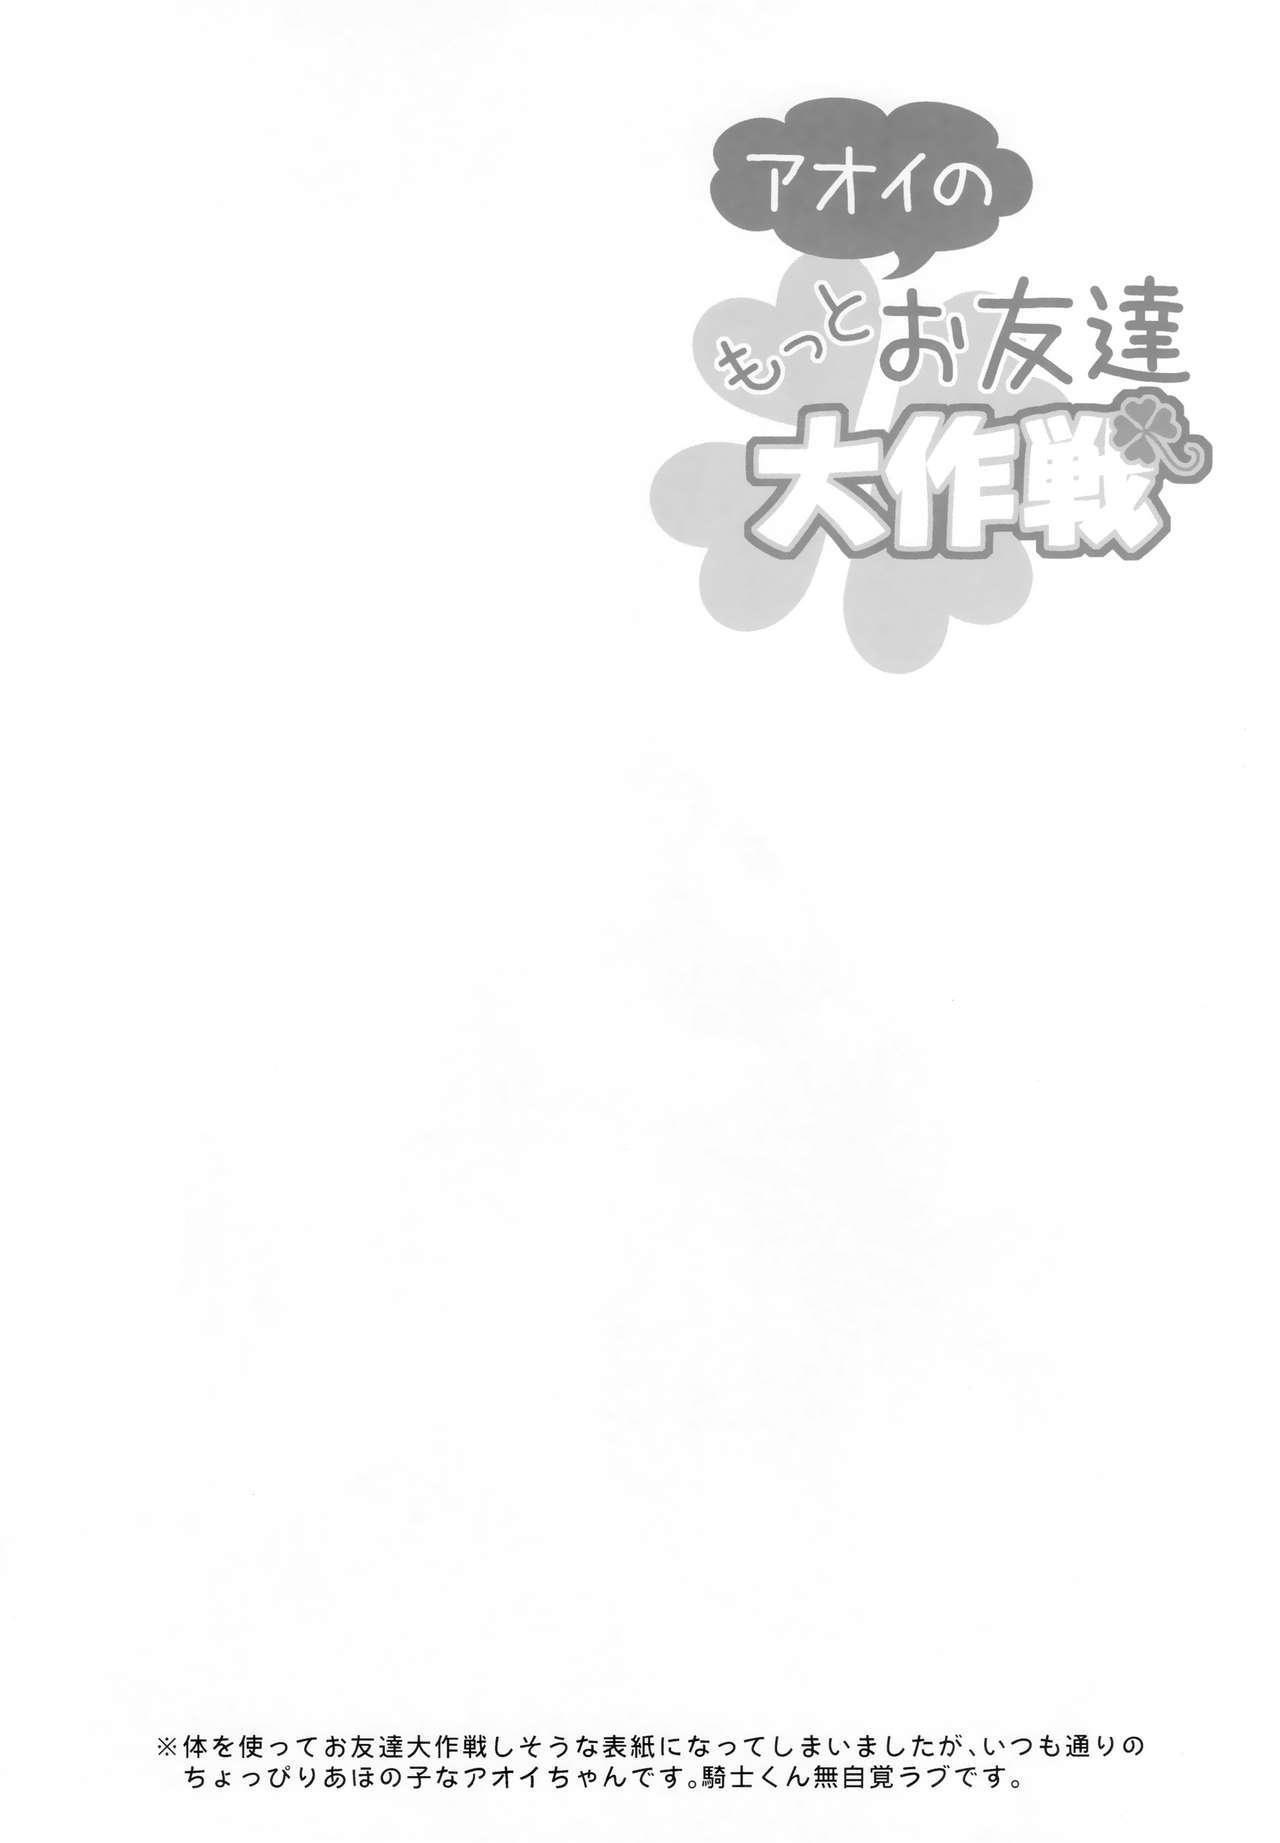 Aoi no Motto Otomodachi Daisakusen 3